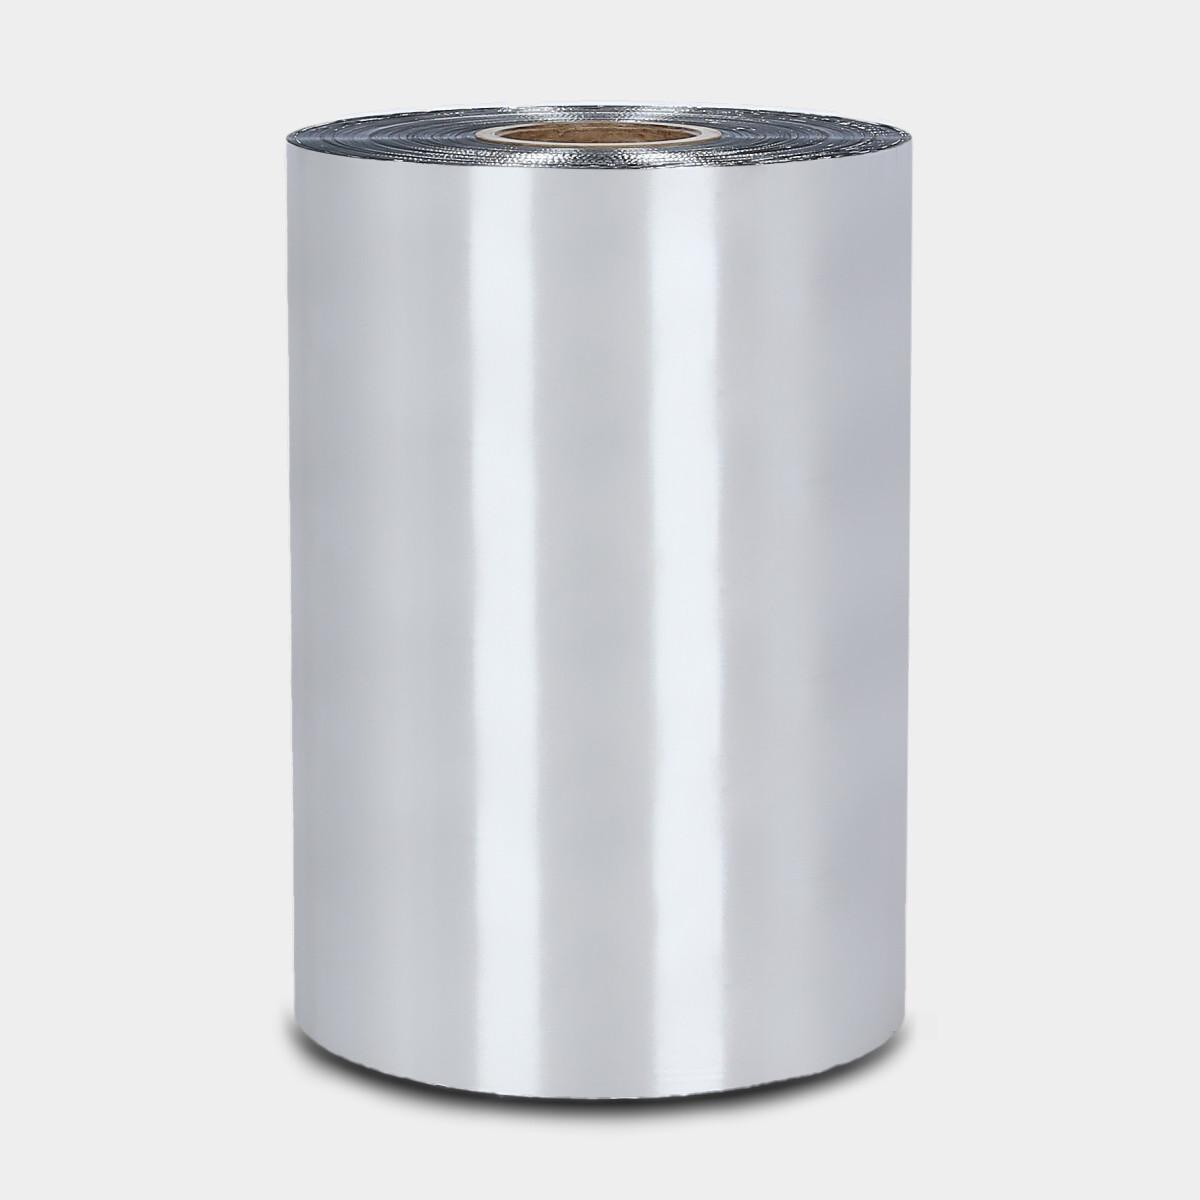 Pet termal folija silver 22my/660mm